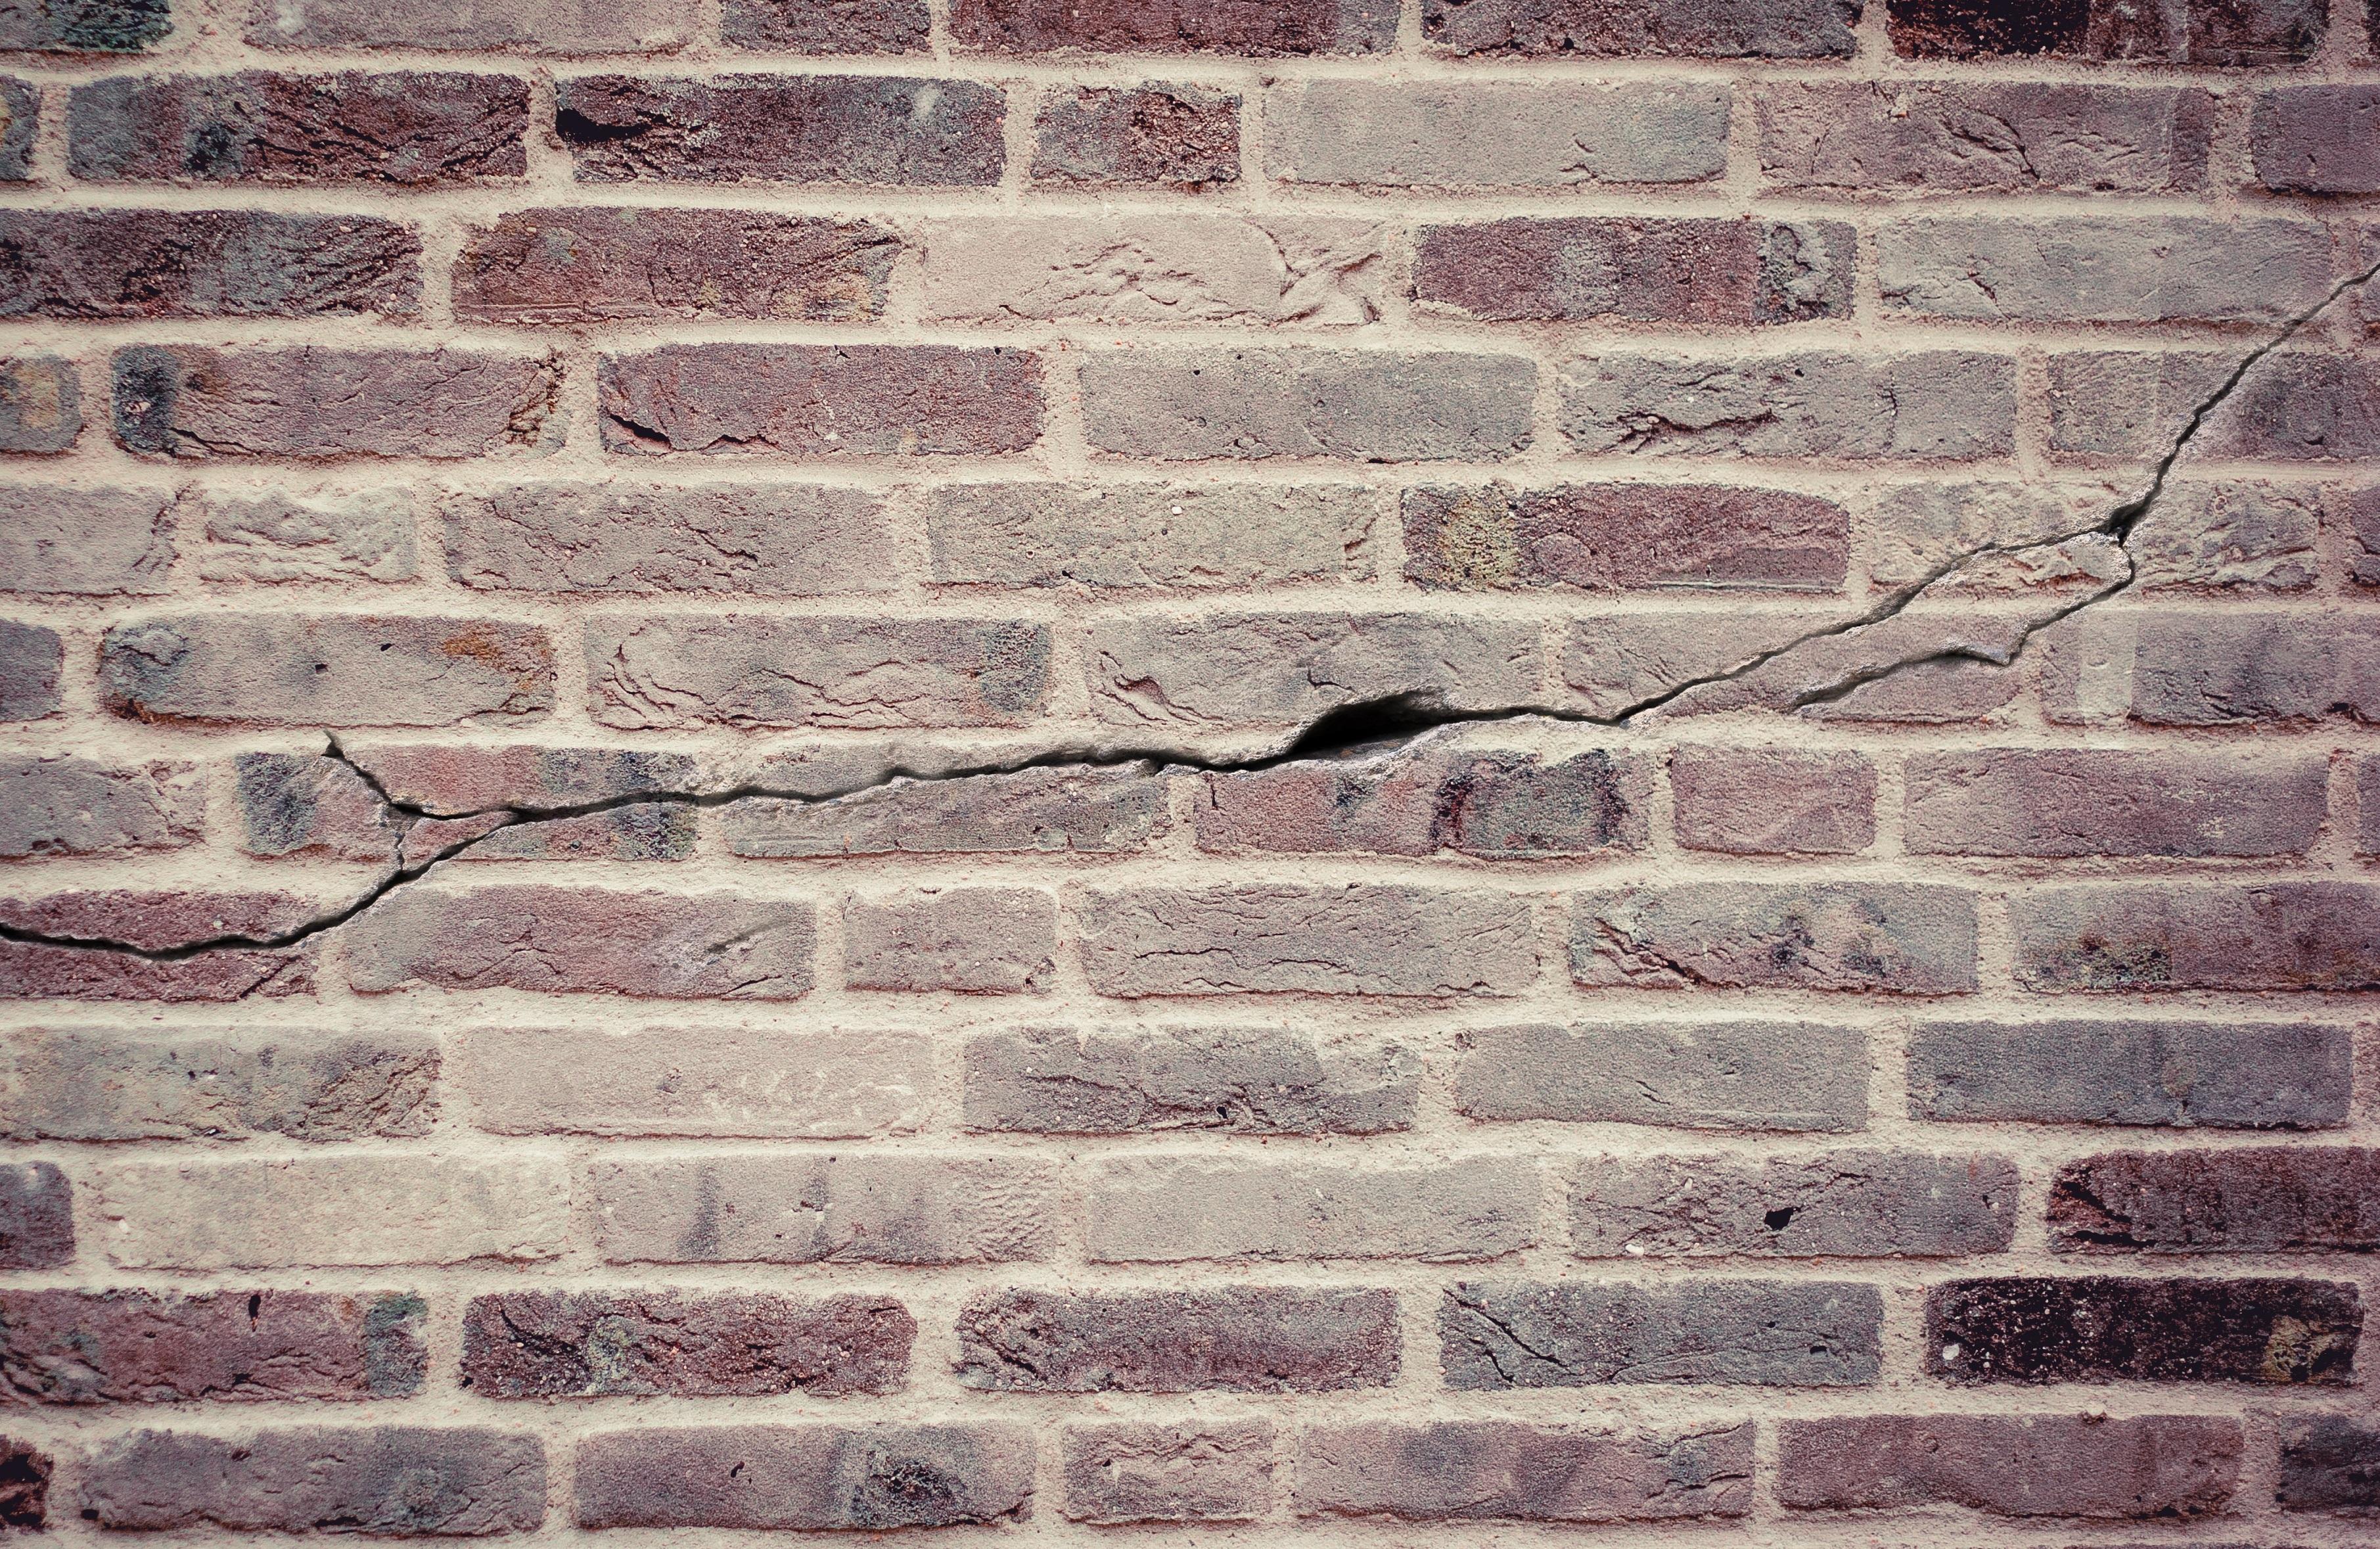 Free Images  floor, broken, crack, facade, stone wall, material, stones, bri